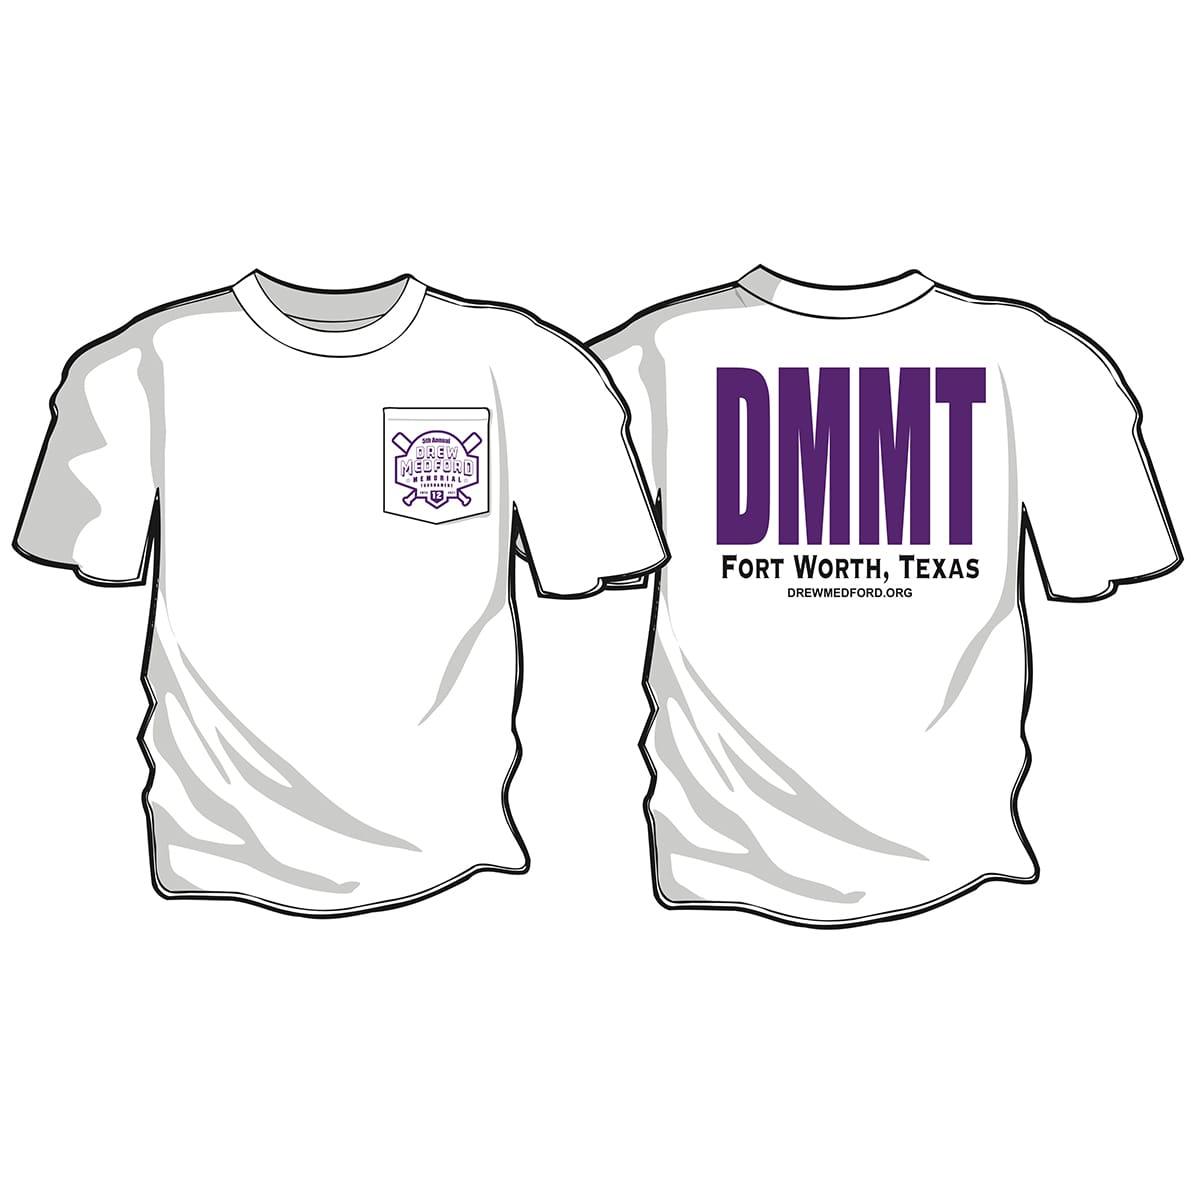 2021 Drew Medford Tournament Shirt